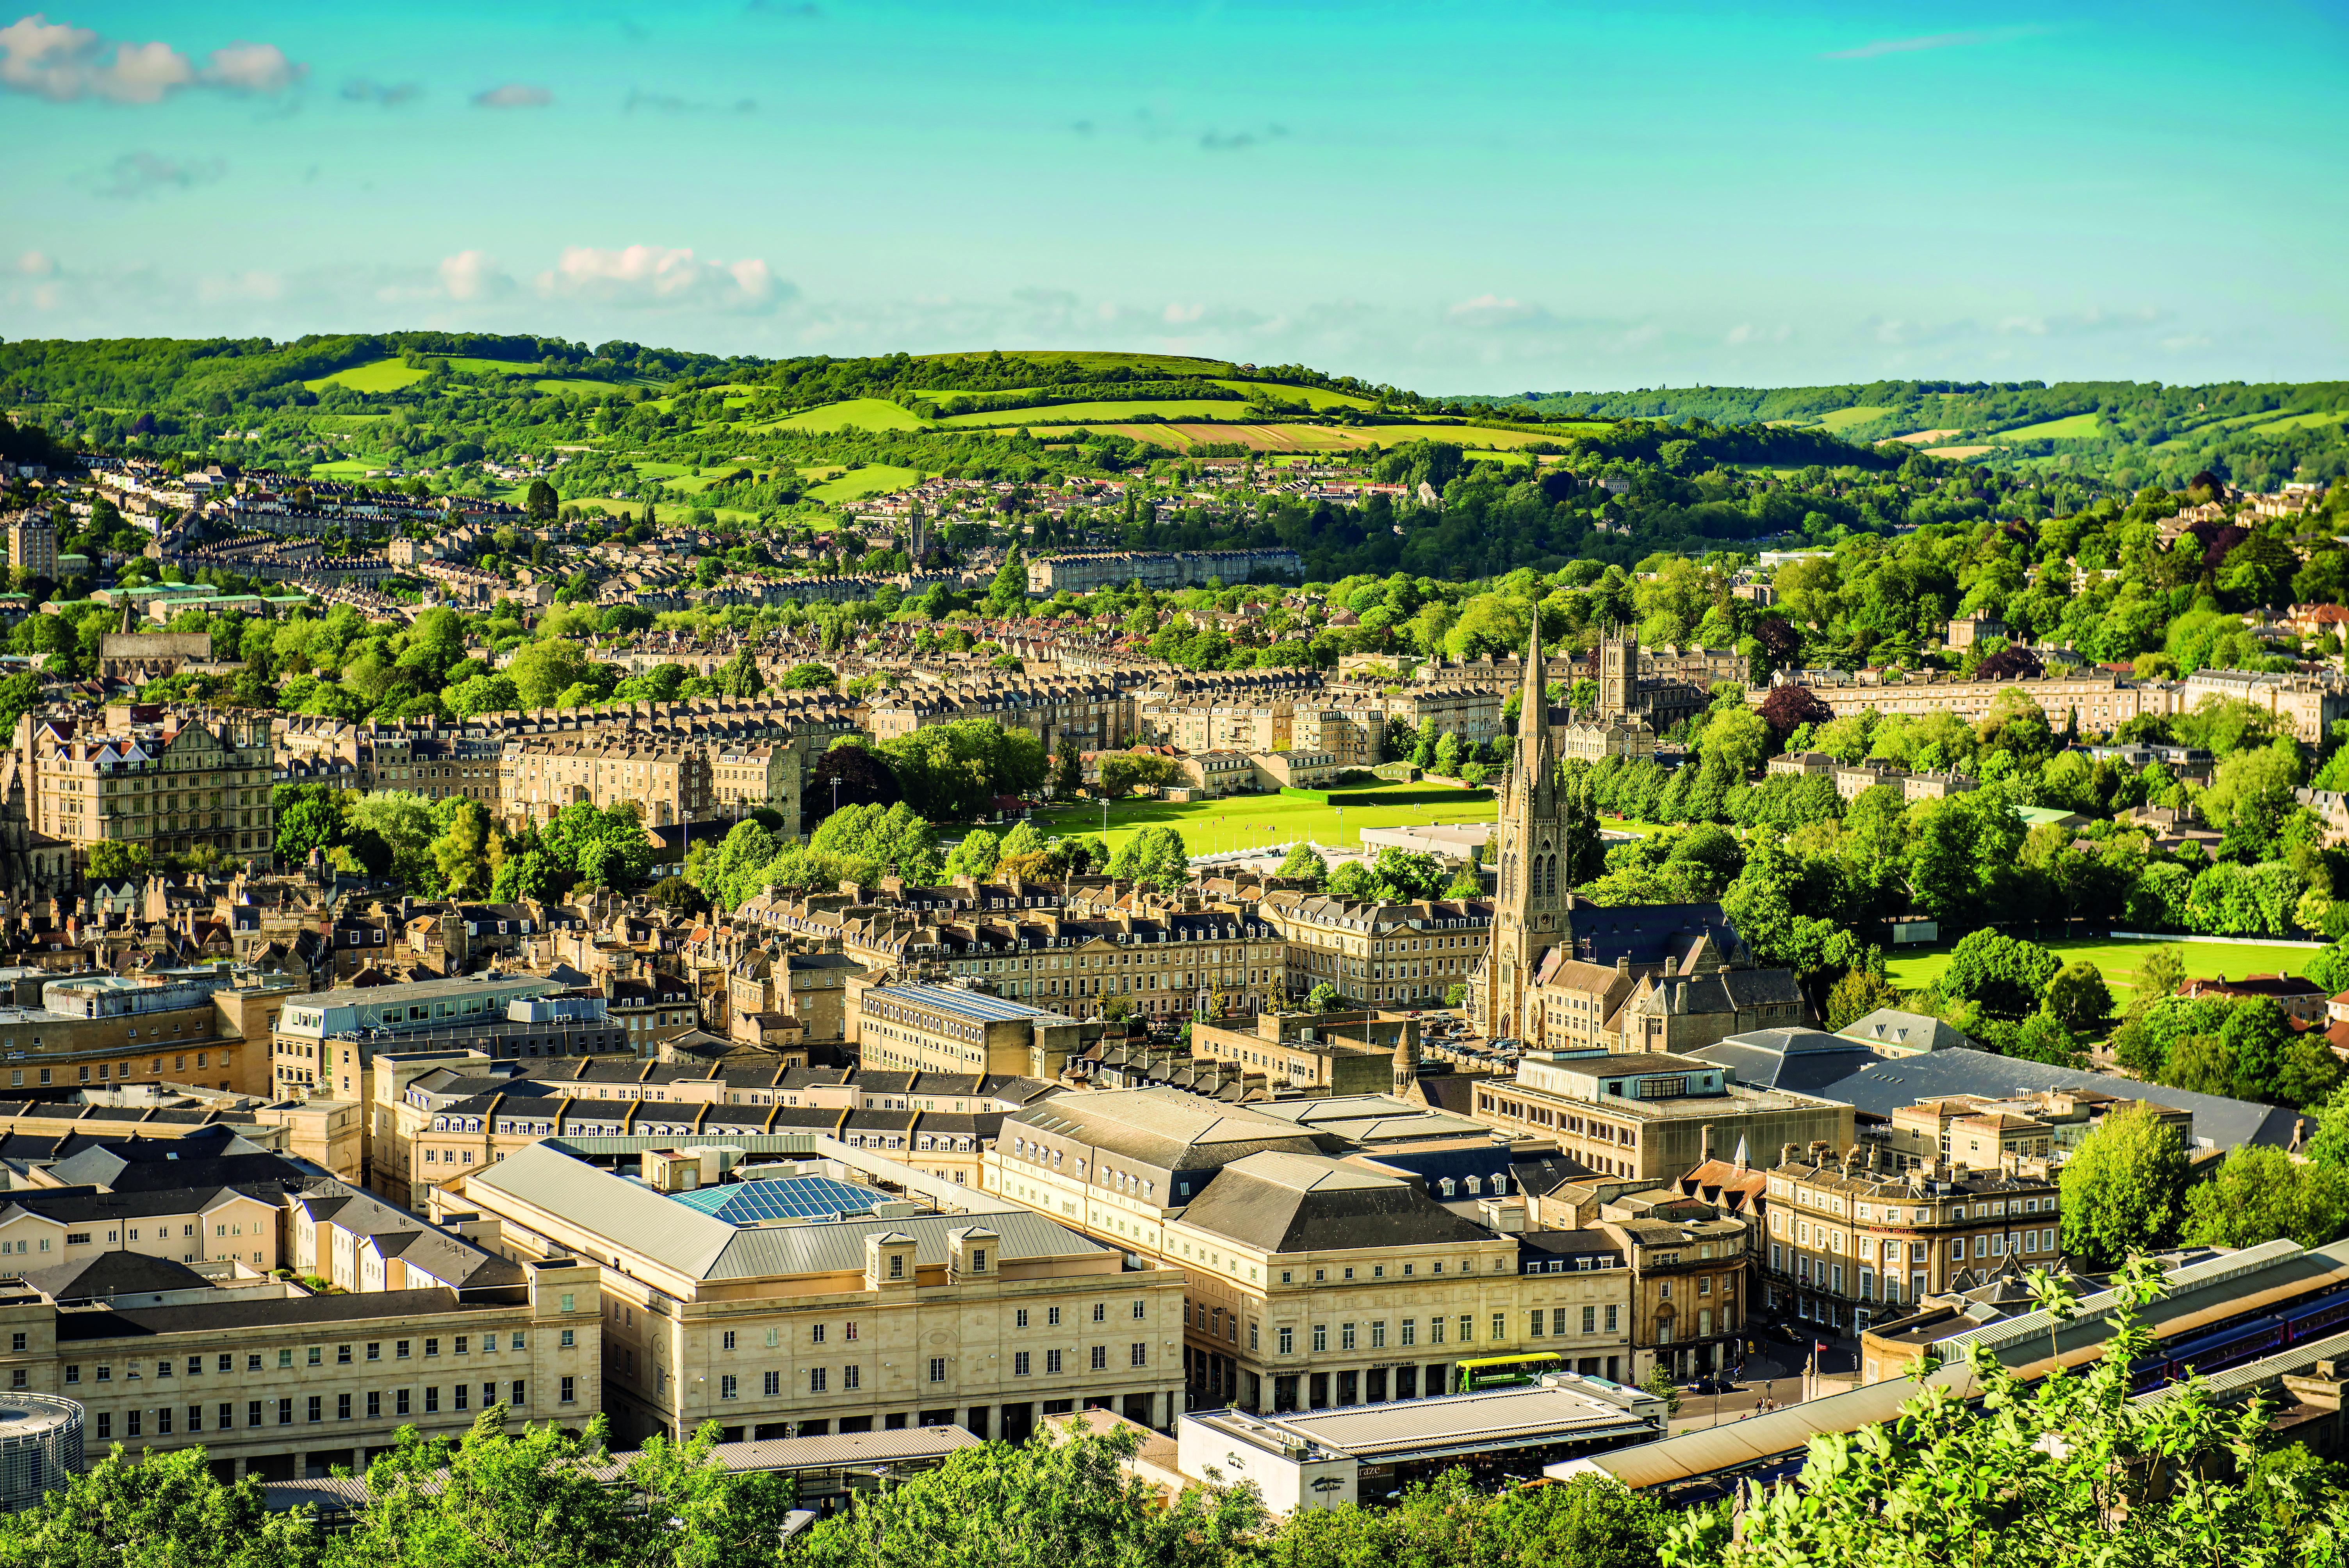 Aerial shot of Bath with a bright blue sunny sky